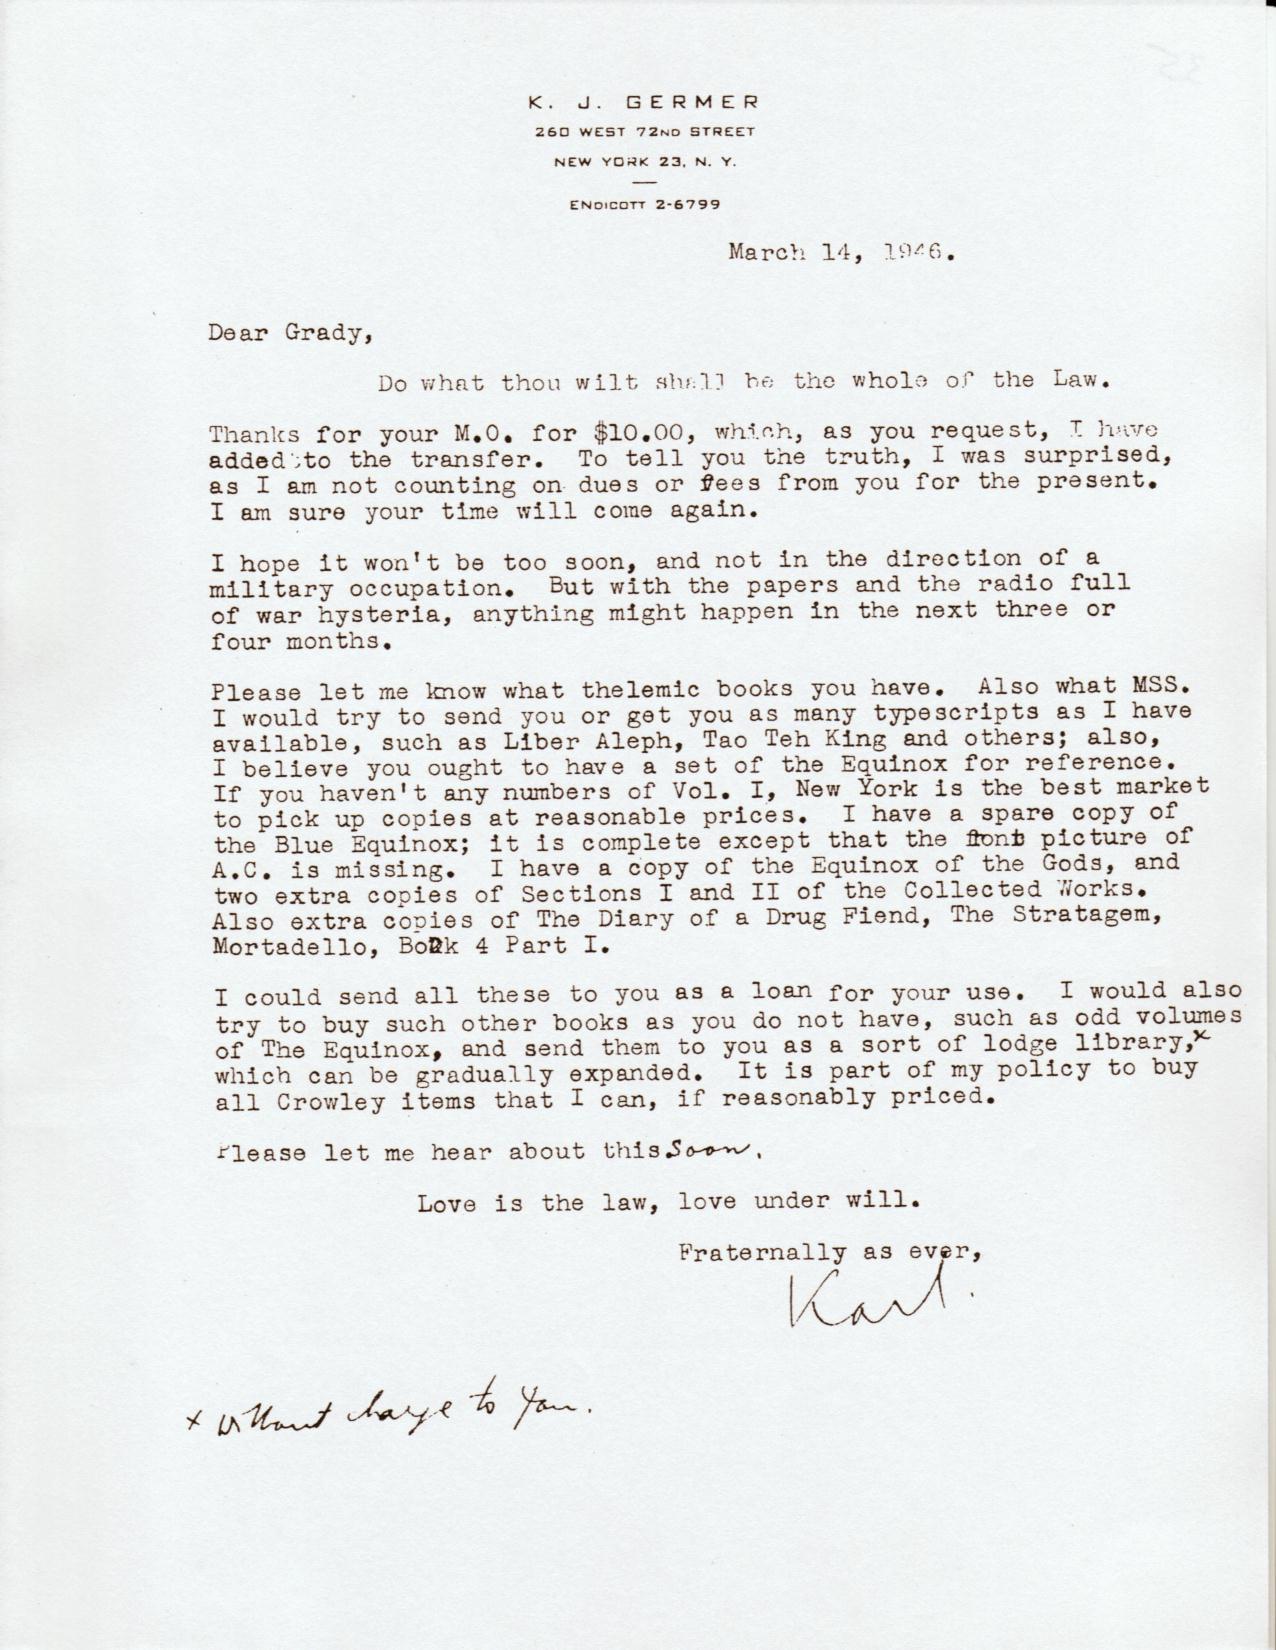 (03/14/1946) Karl Germer to Grady McMurtry